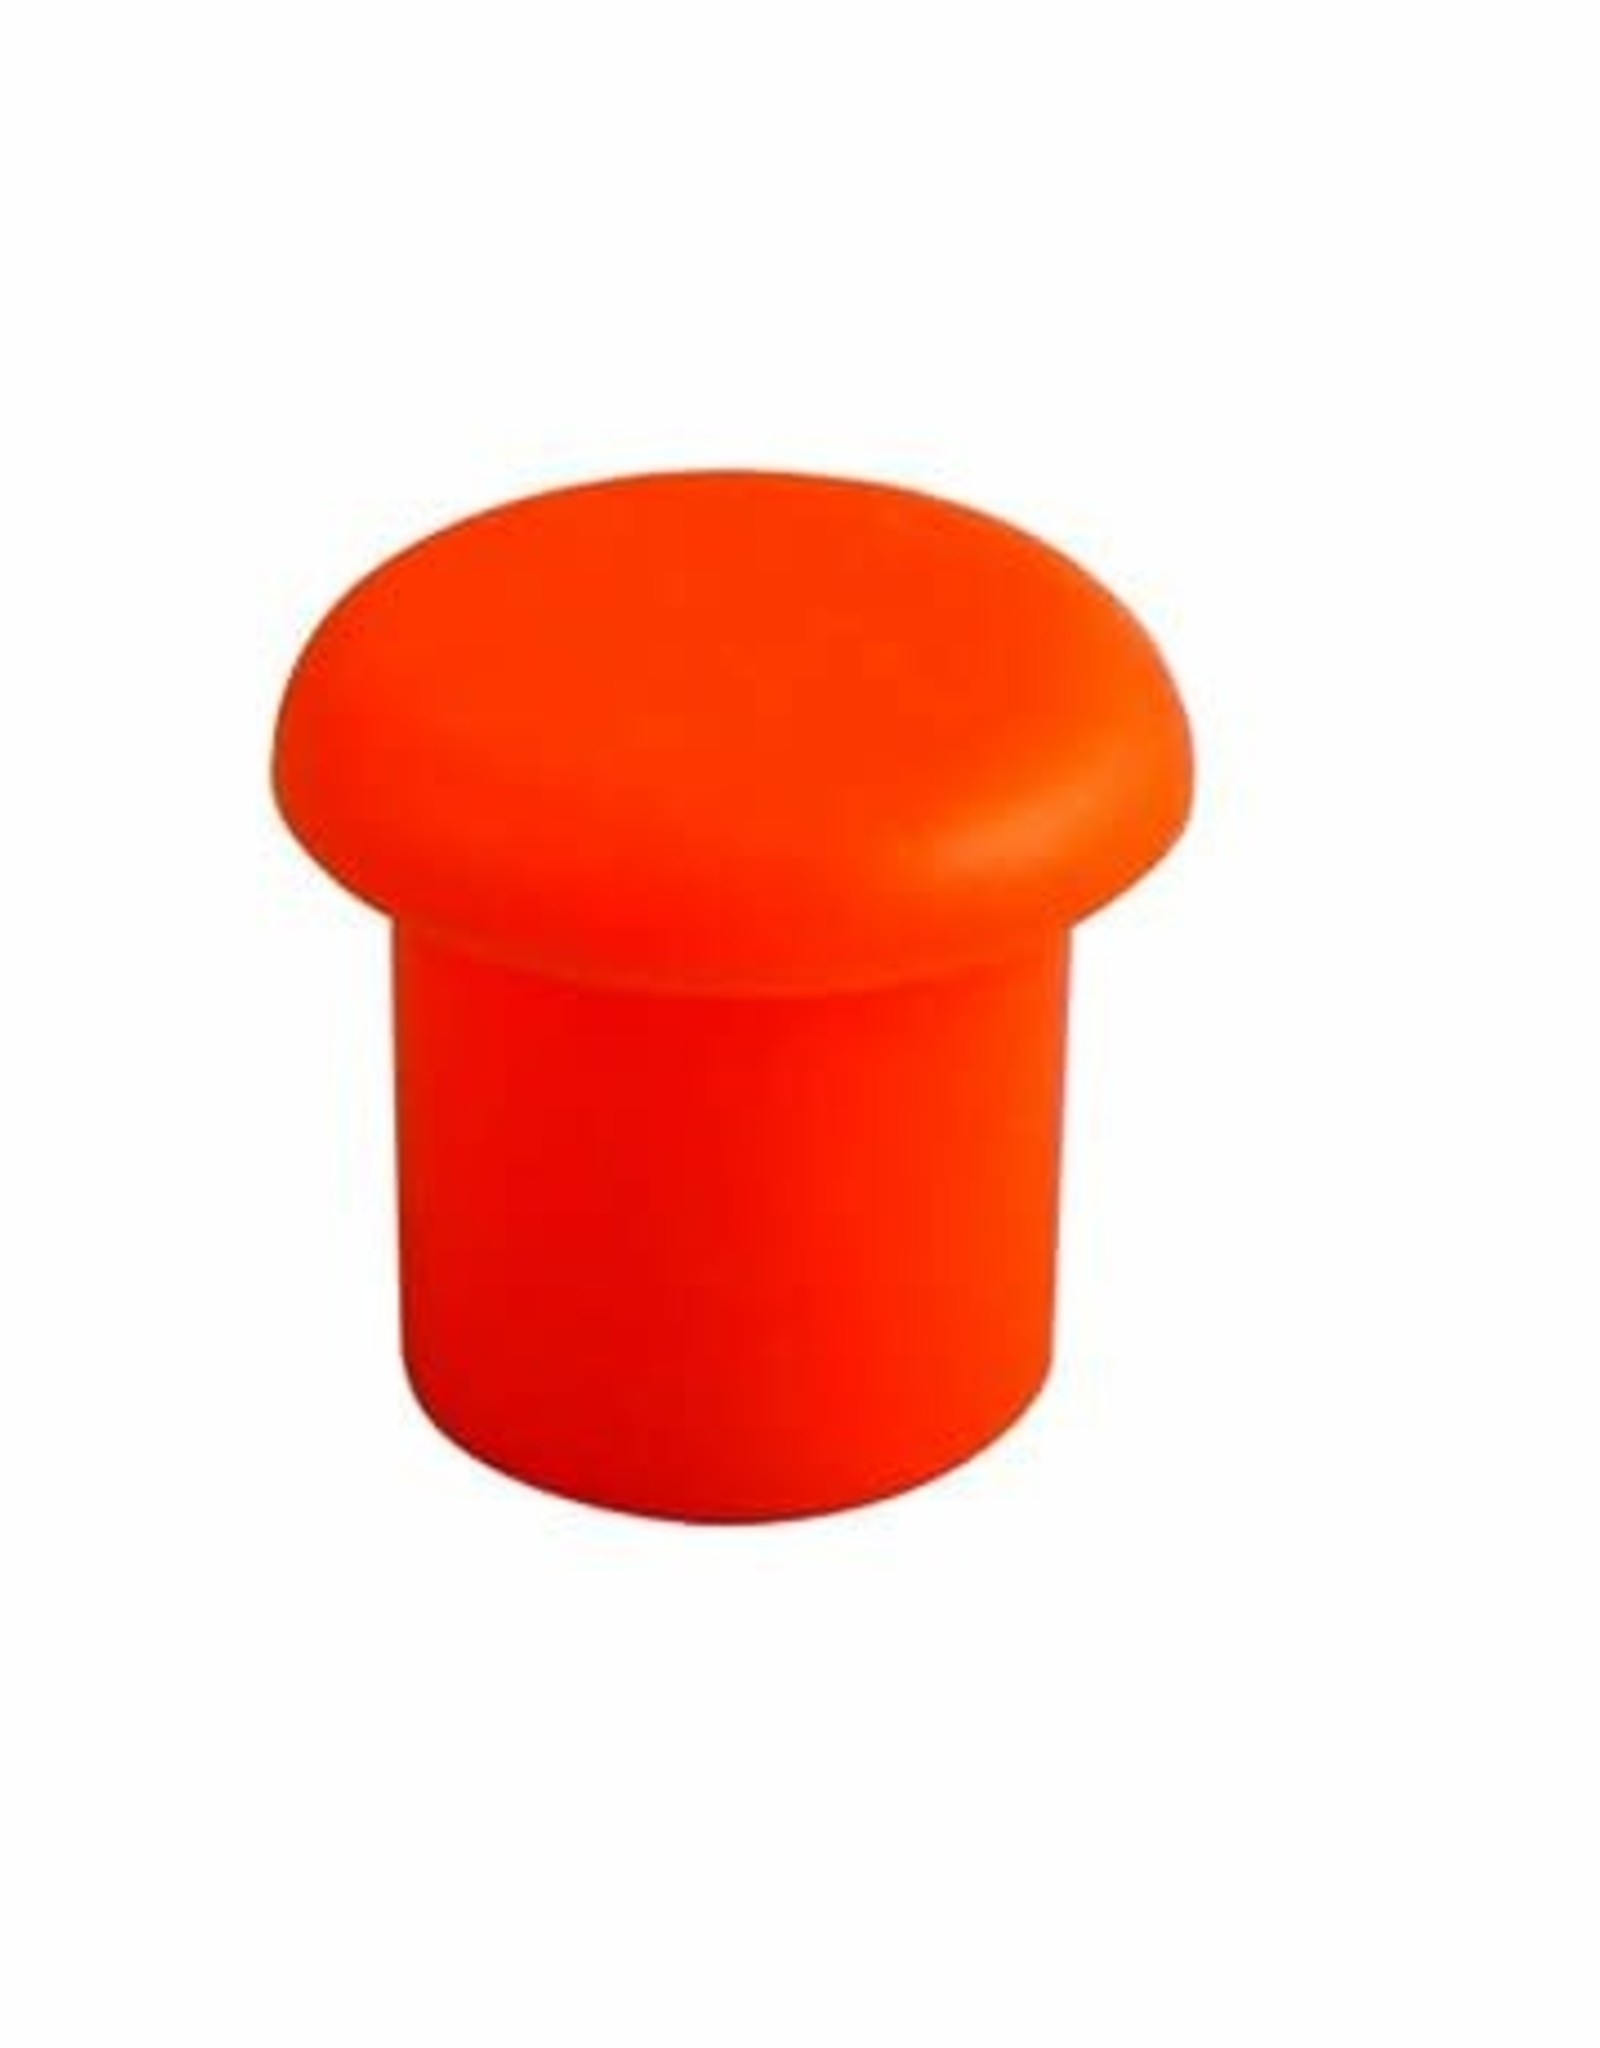 Econ-O-Guard Econ-O-Guard Mushroom Top Safety Caps, Orange